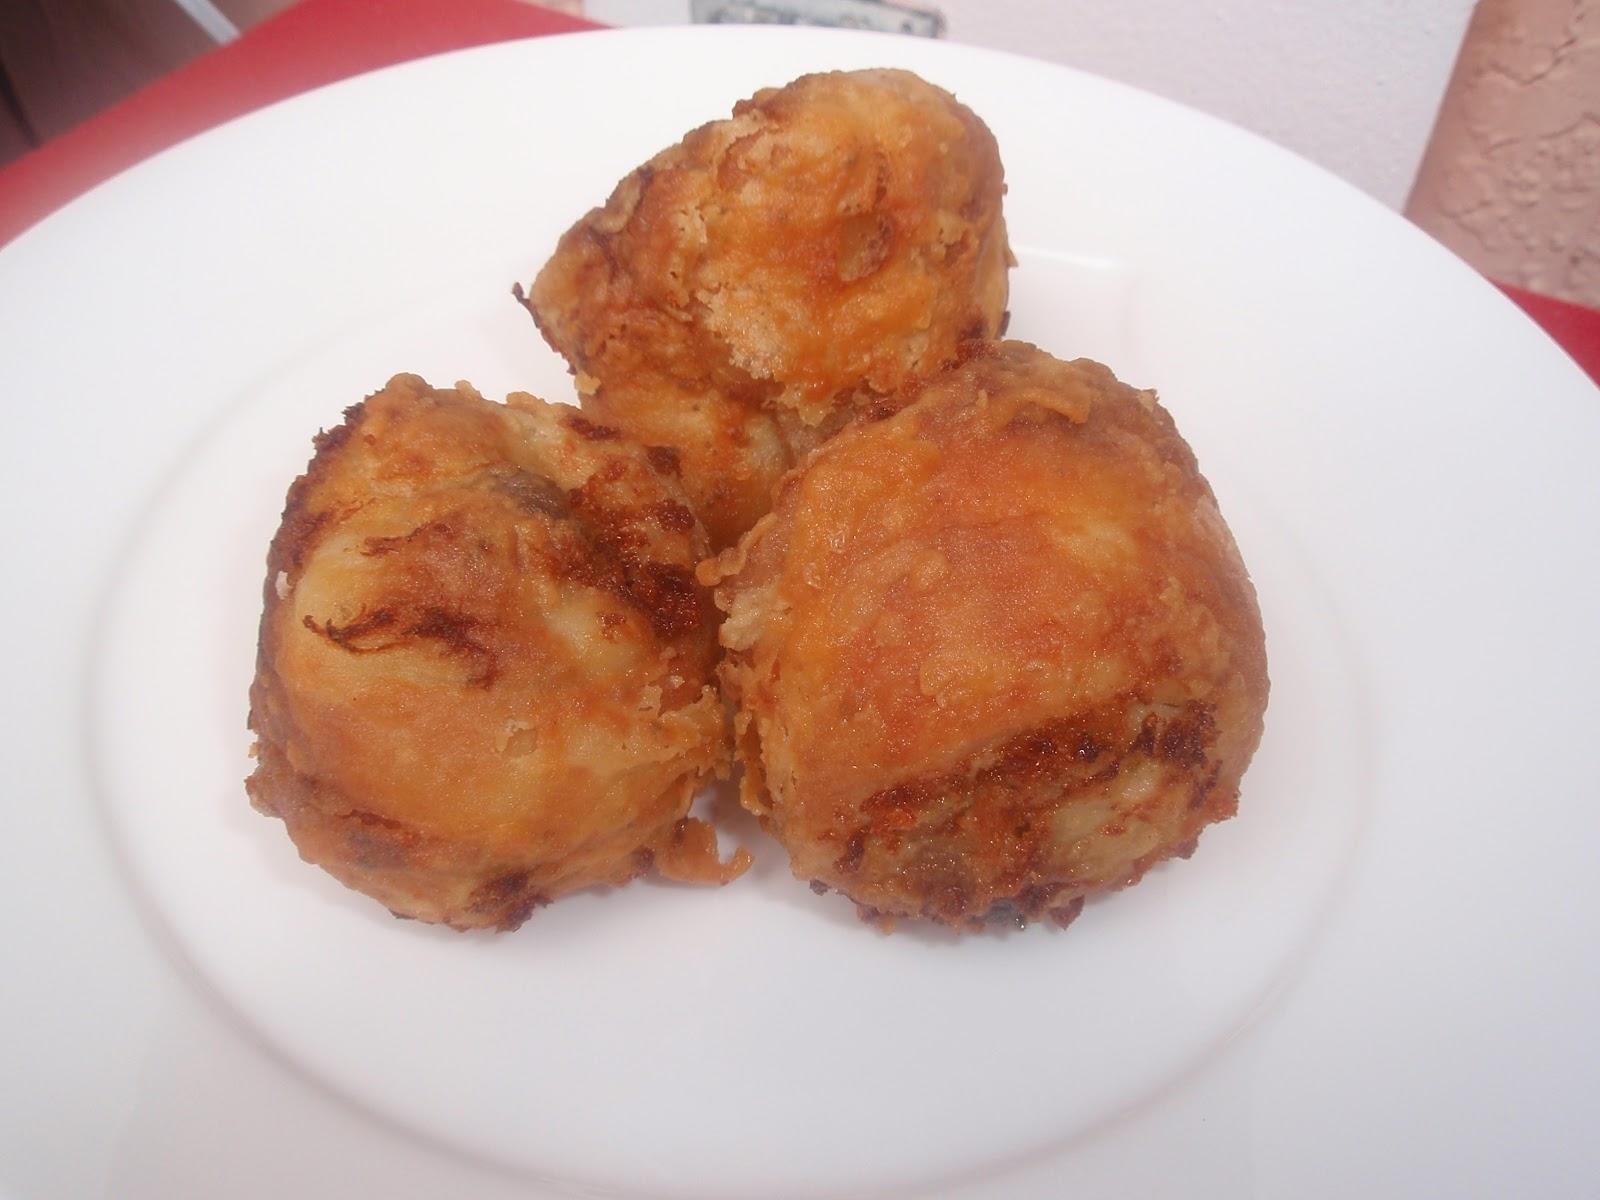 Tits Naked Chunk Chicken Pics